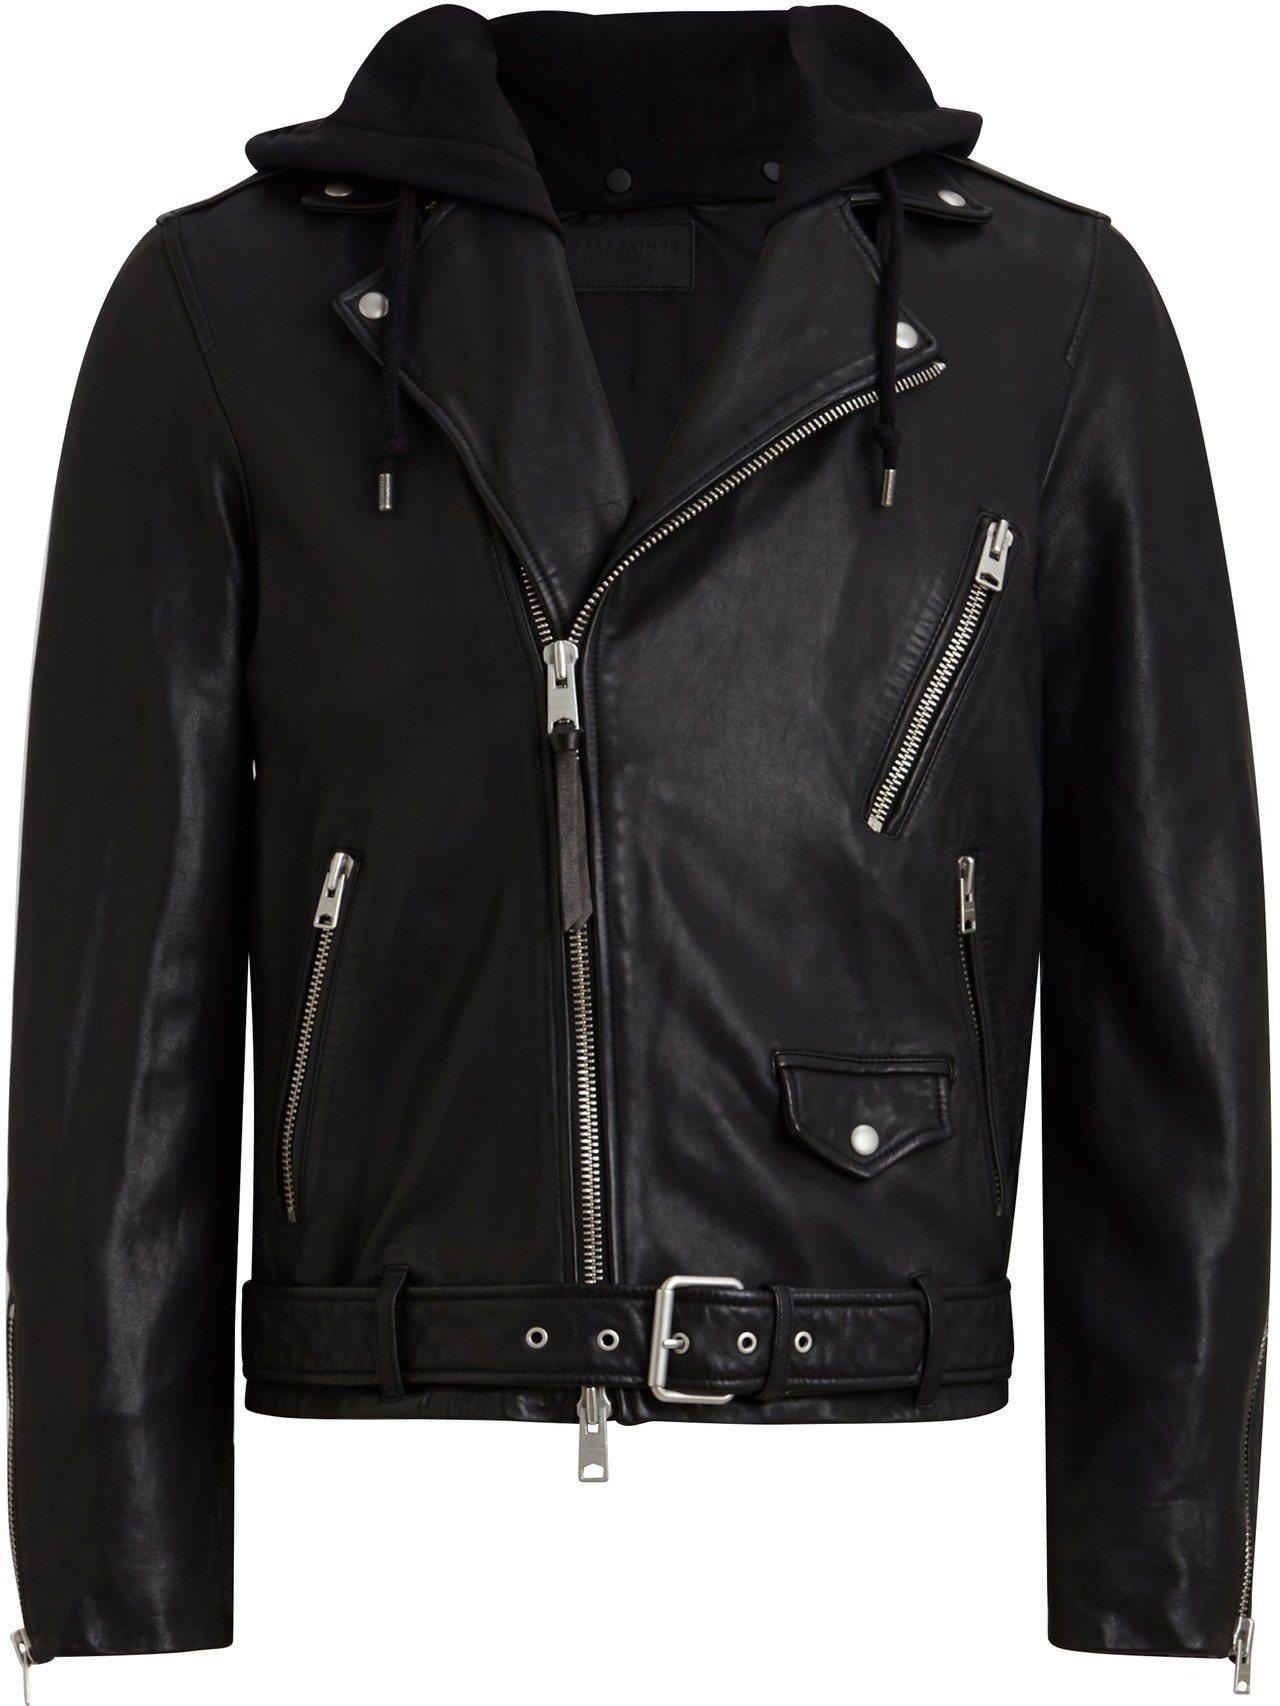 AllSaints Renzo連帽騎士夾克,21,500元。圖/AllSaint...